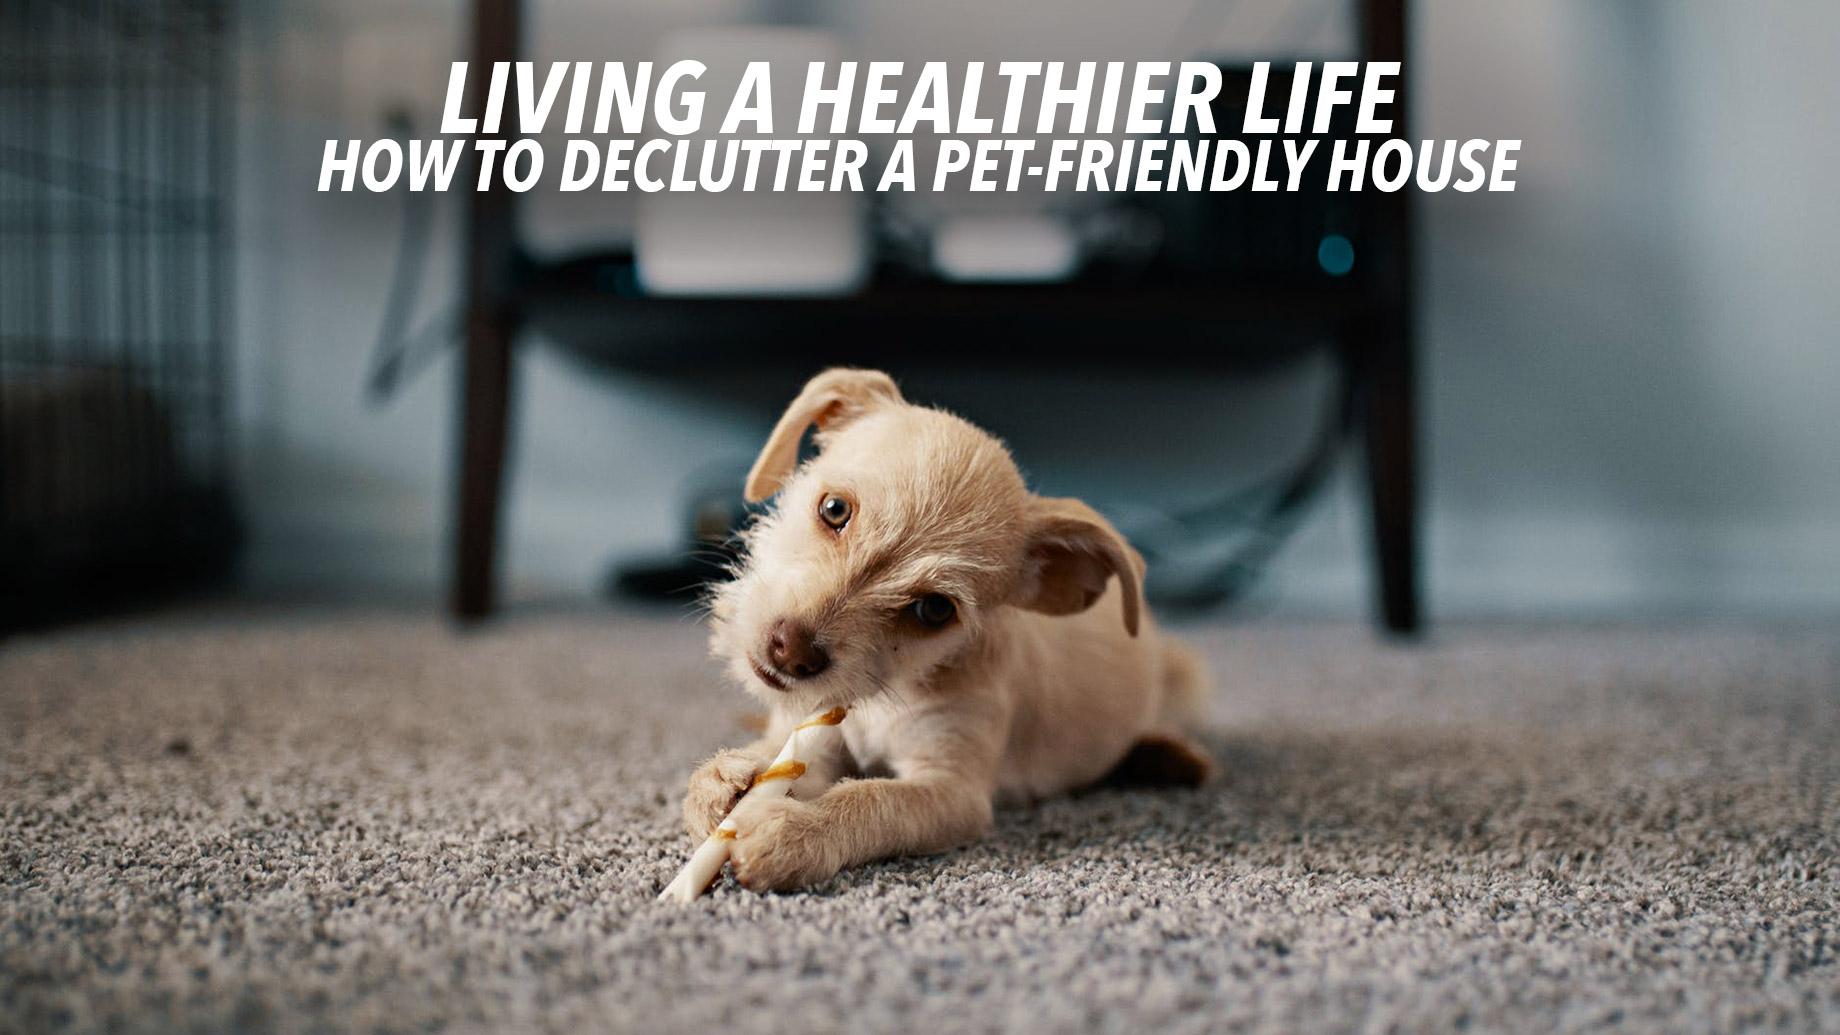 Dr. Clo pets